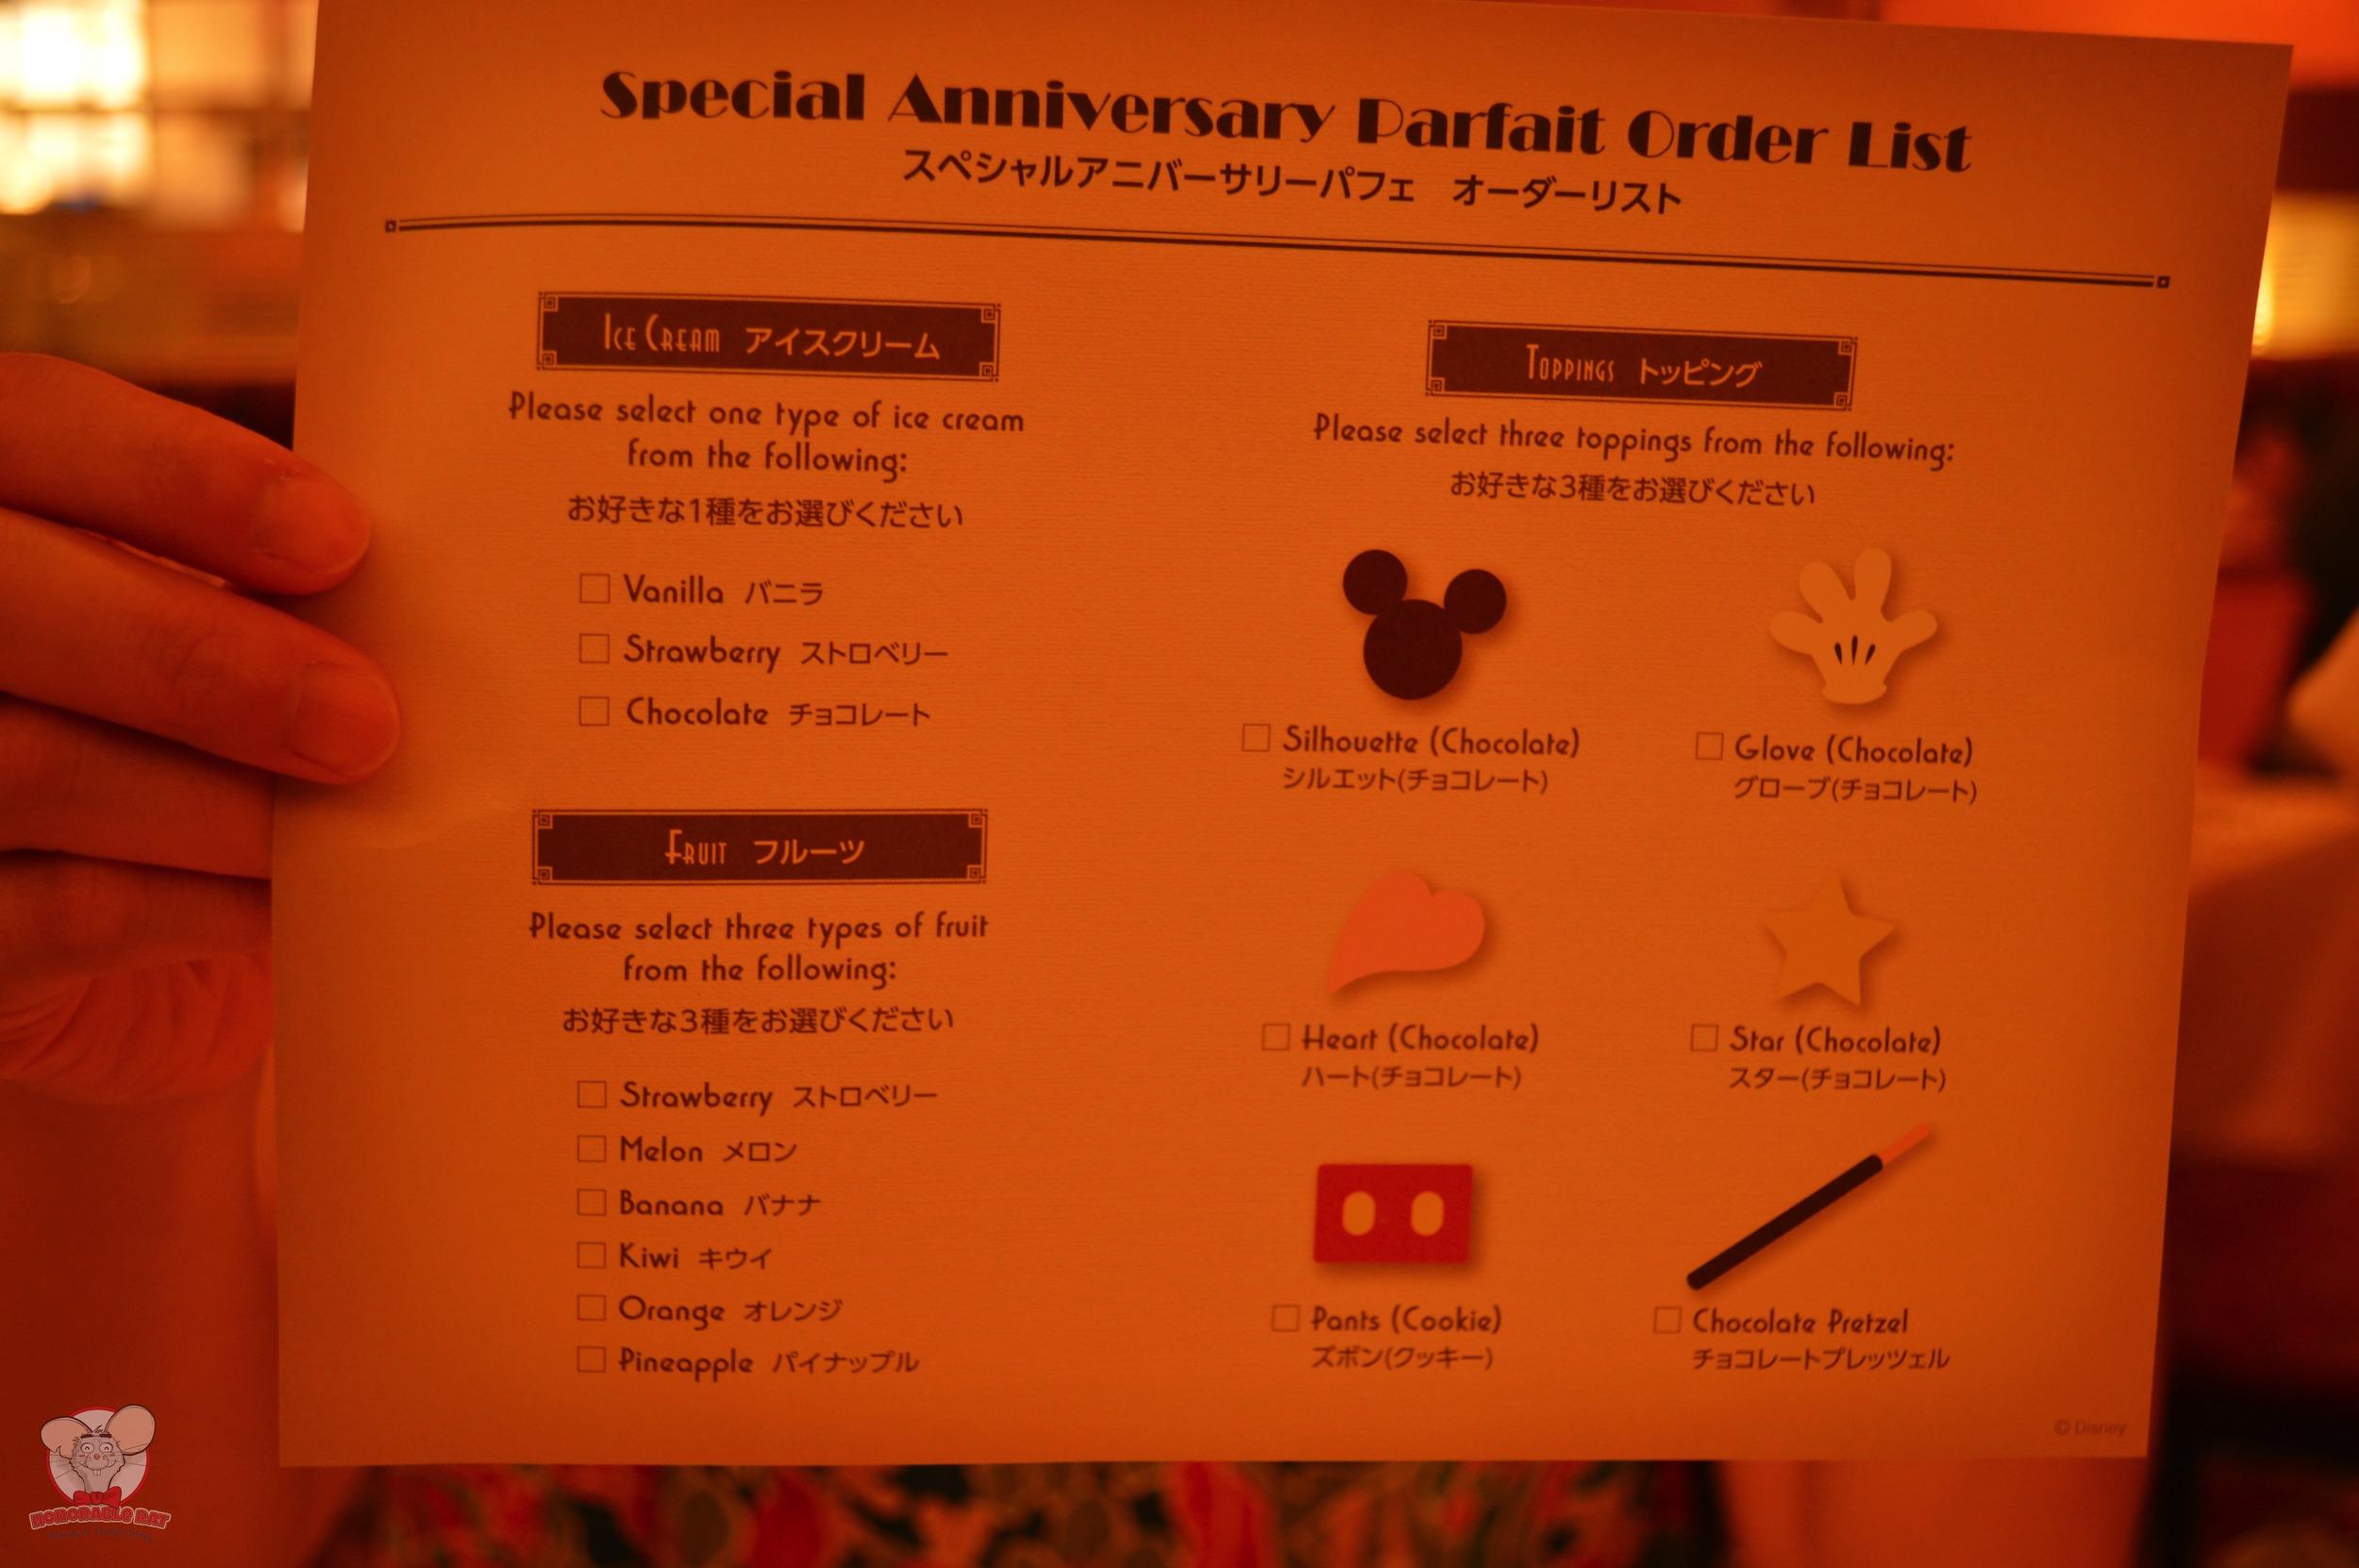 Special Anniversary Parfait Order List